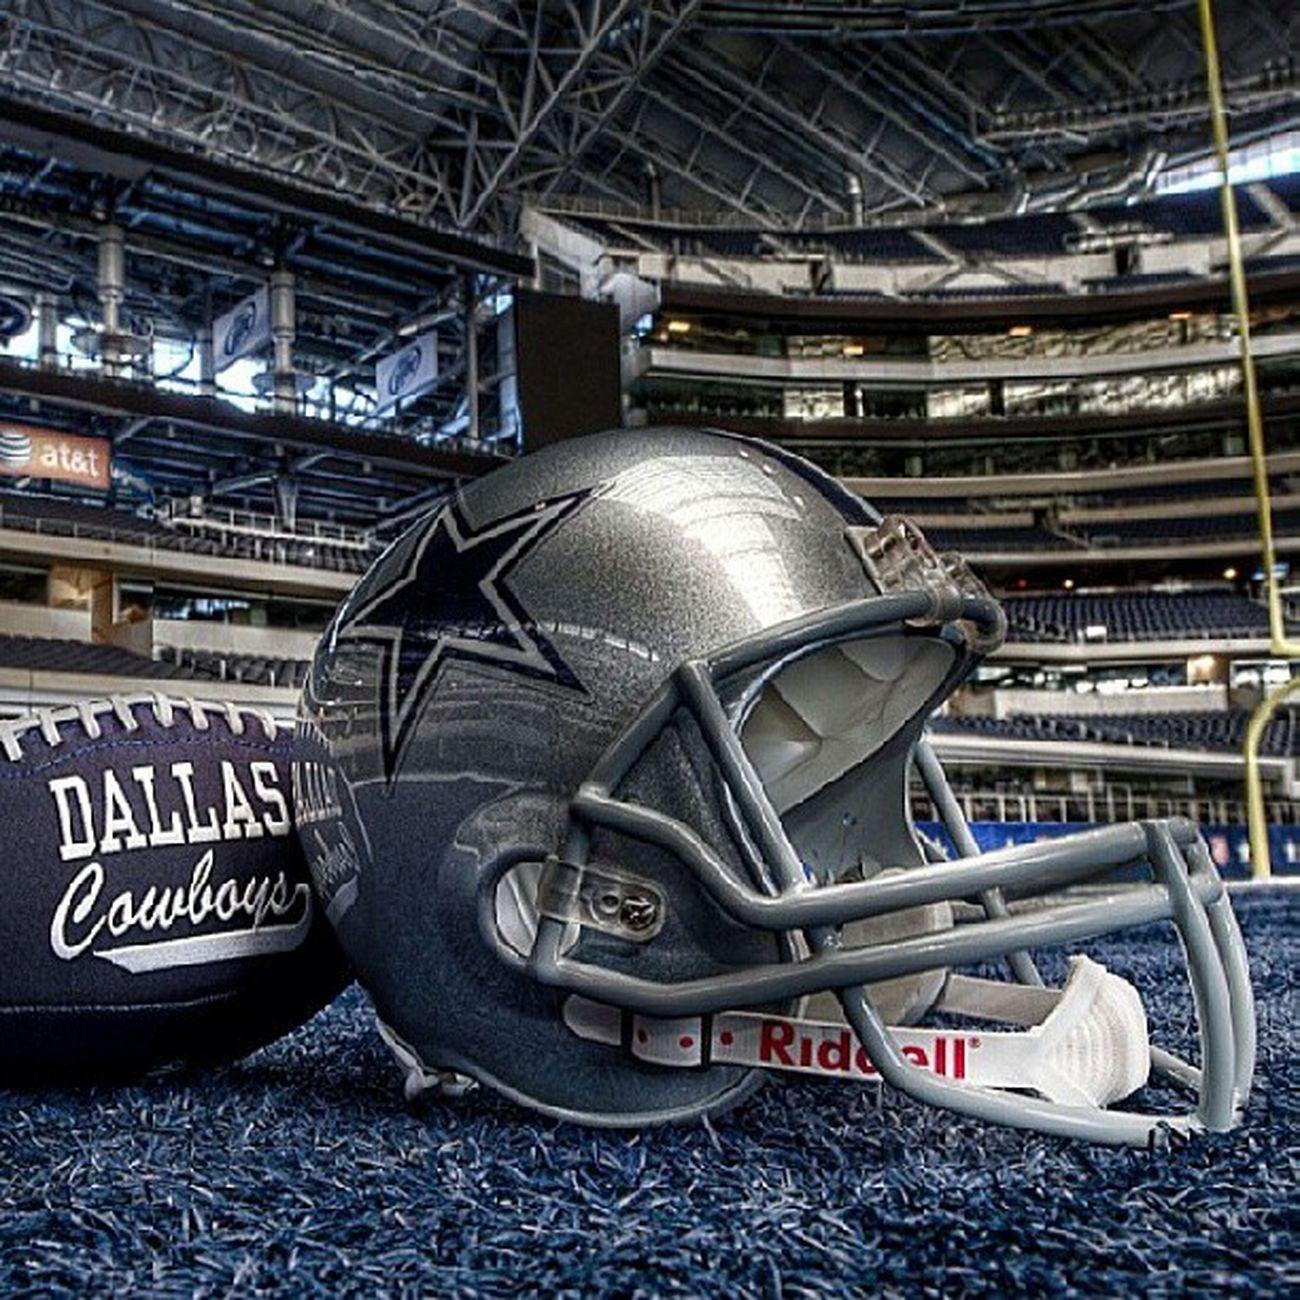 :-) HowBoutThemCowboys GoDallas GoCowboys Americasteam CowboysNation CowboysAllDay